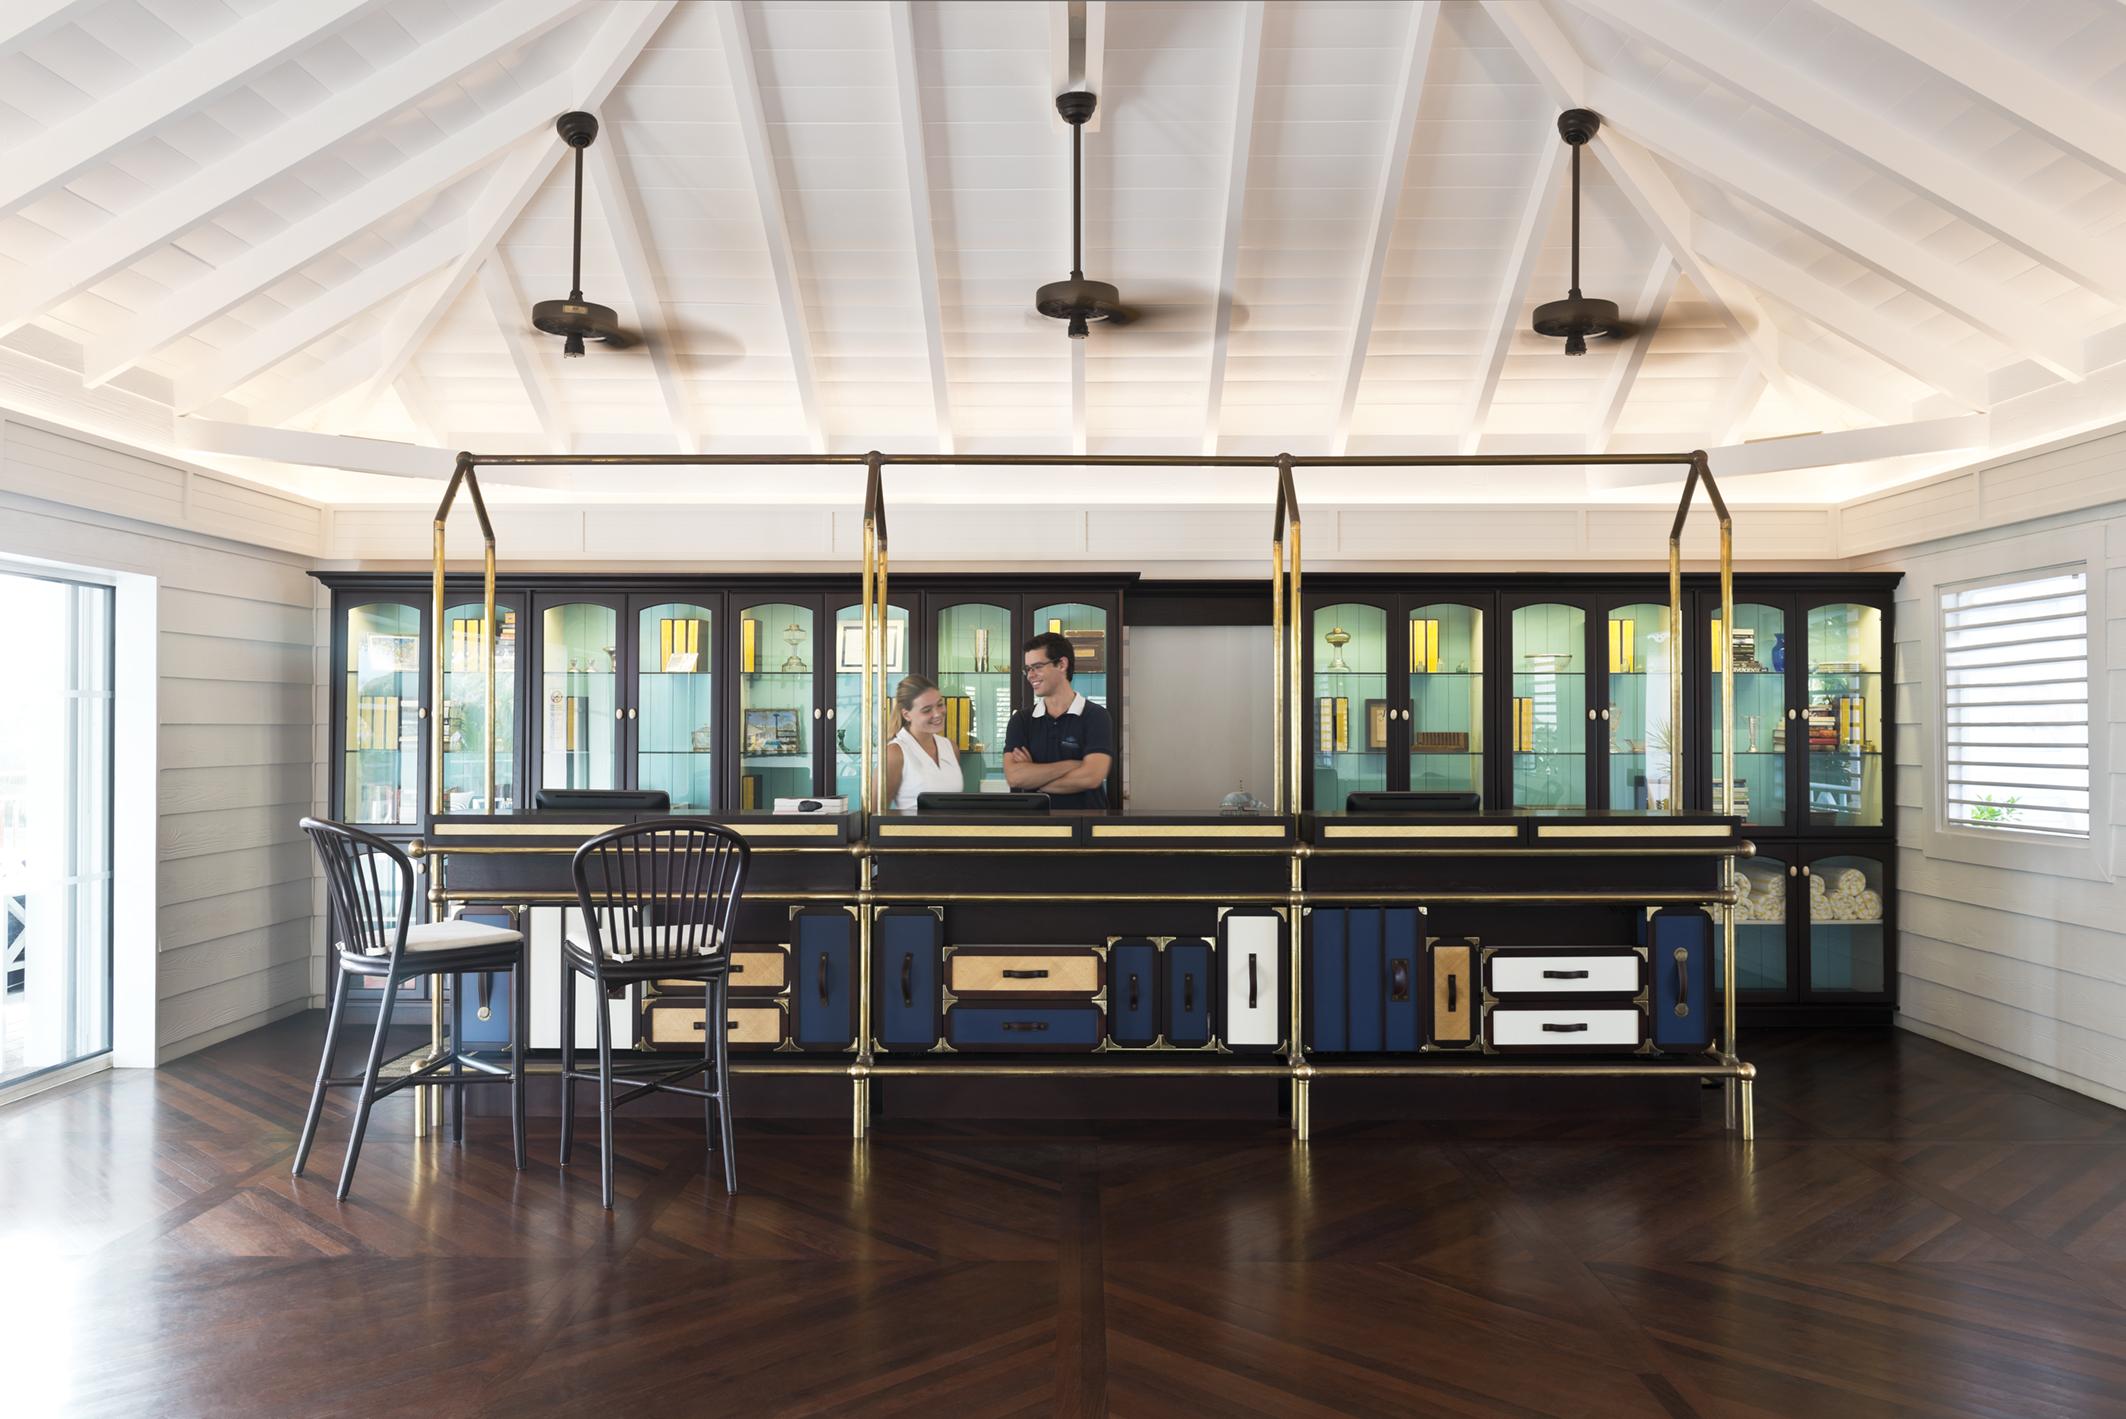 luis pons design interior tropical hotel stbarths_3jpg